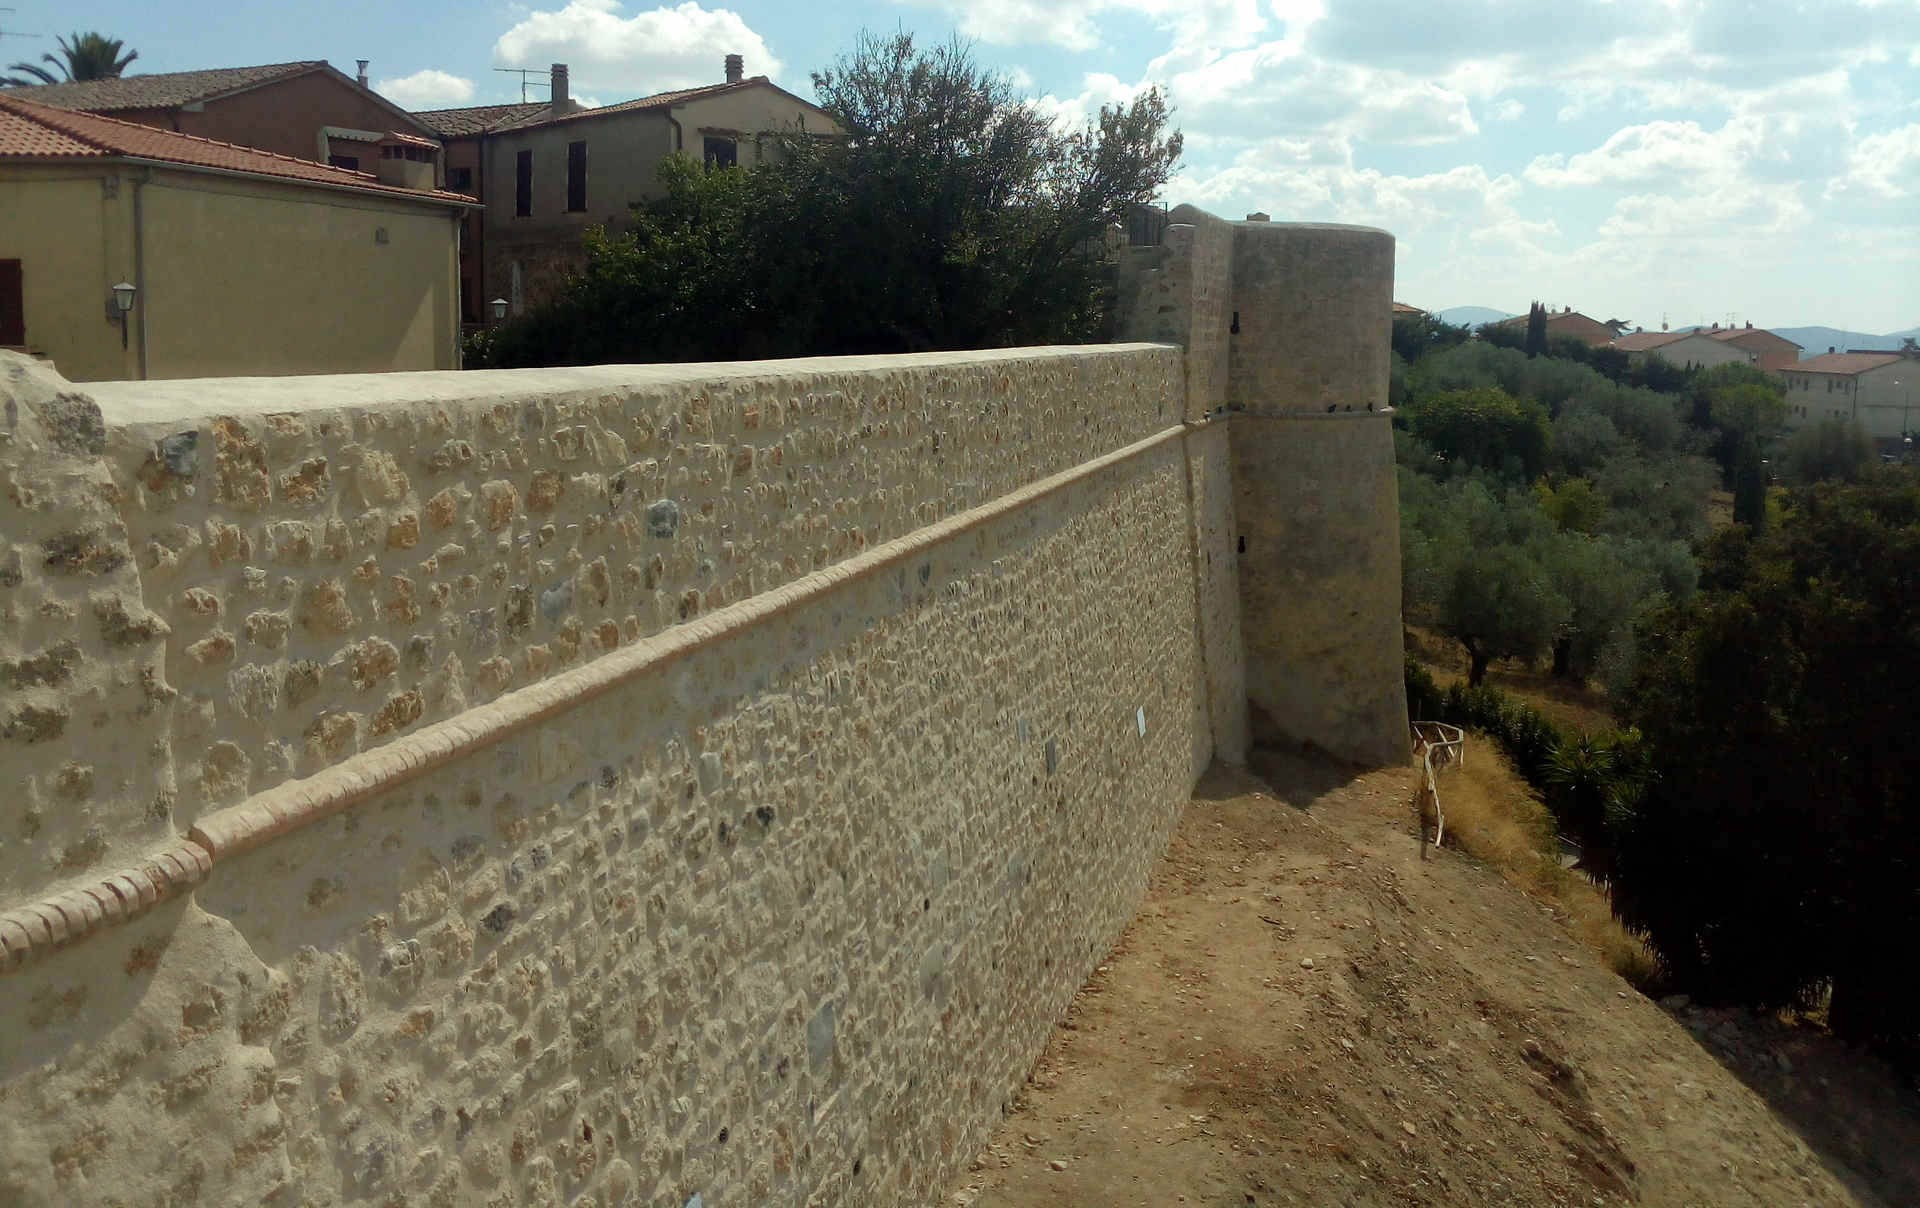 Stadtmauer erbaut im 14. Jh.